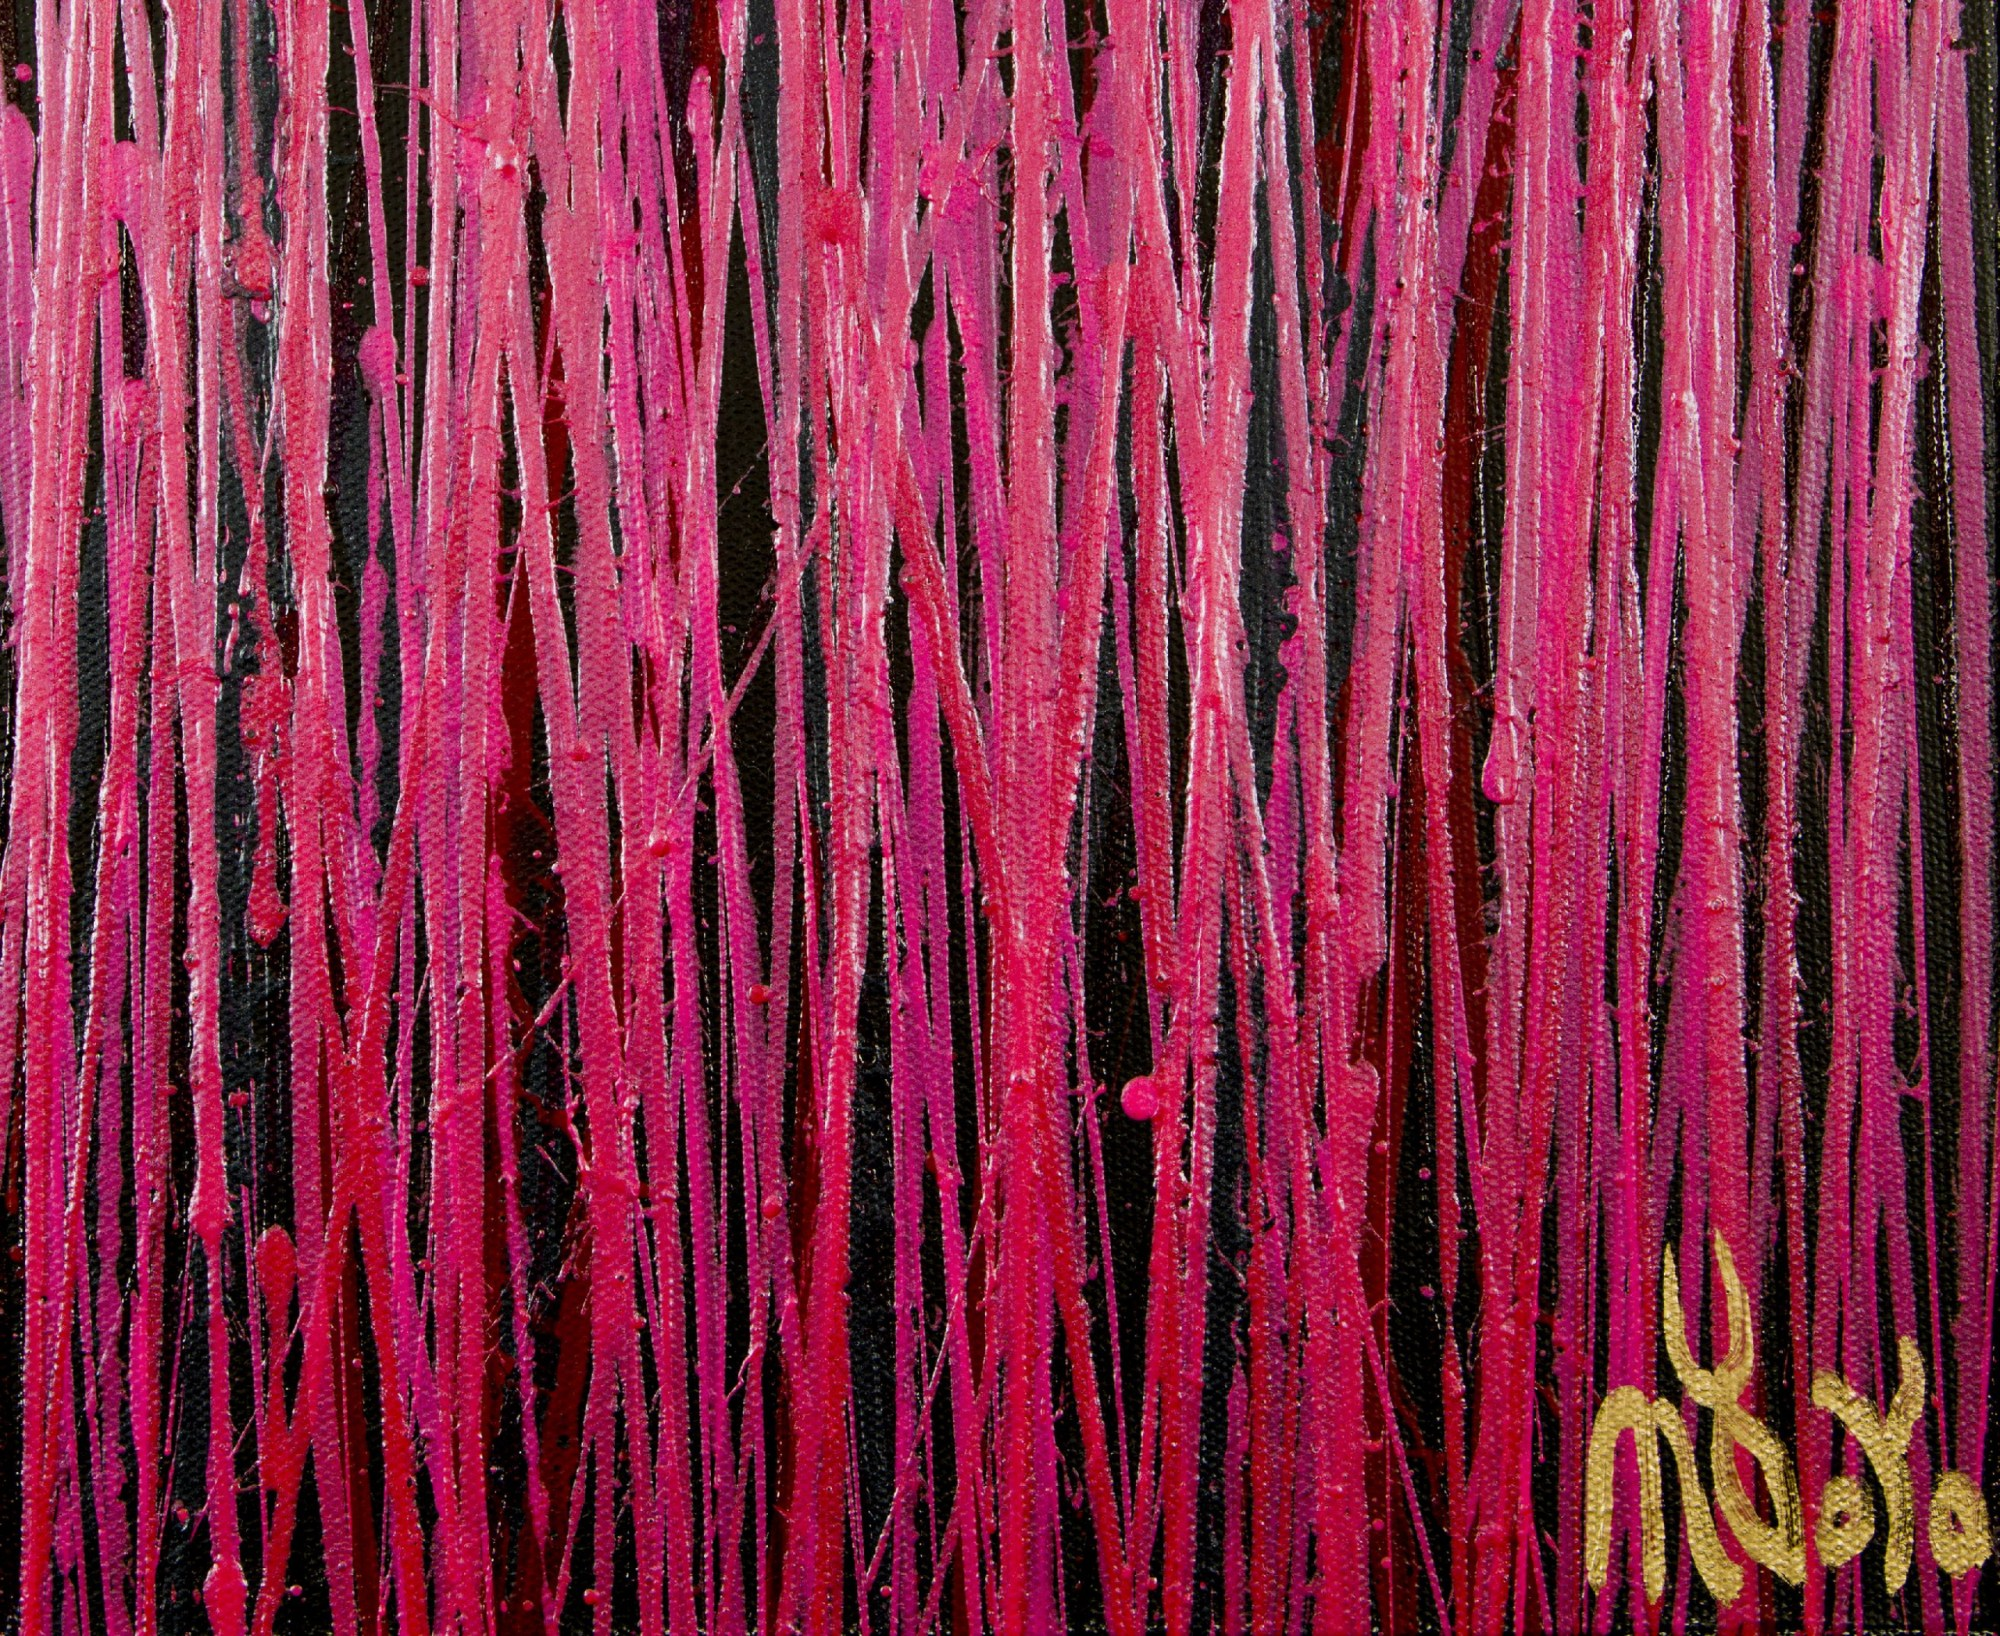 Signature Detail / Carmin Spectra ( Florescent garden) 2 (2020) / Triptych